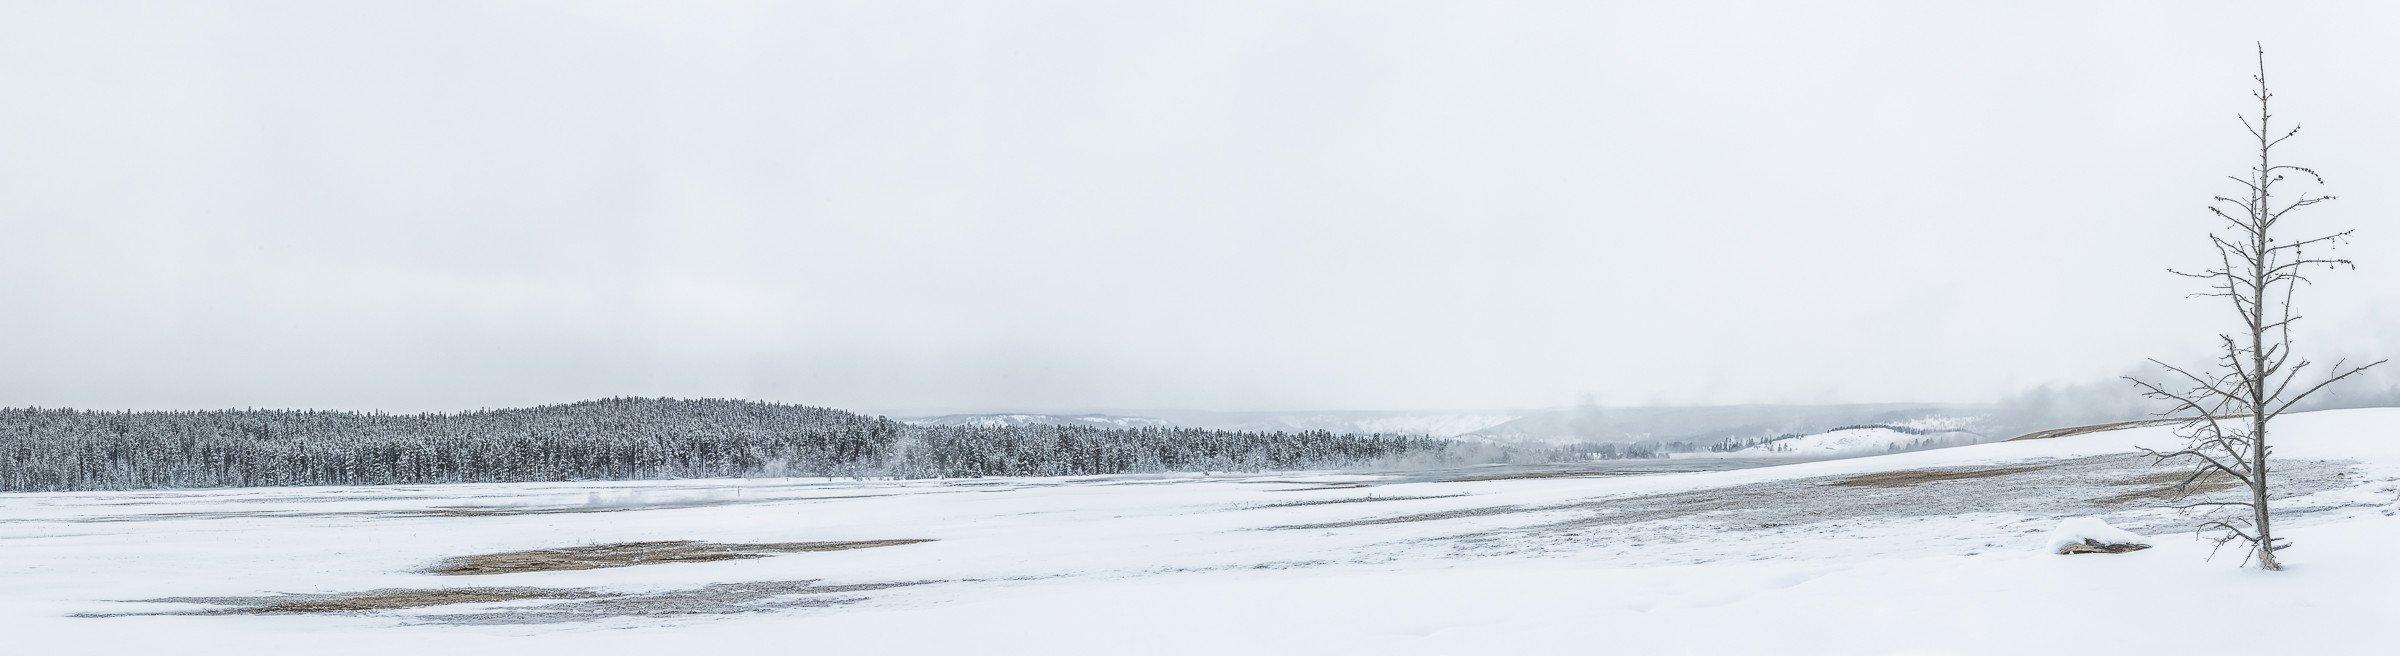 Yellowstone 0194